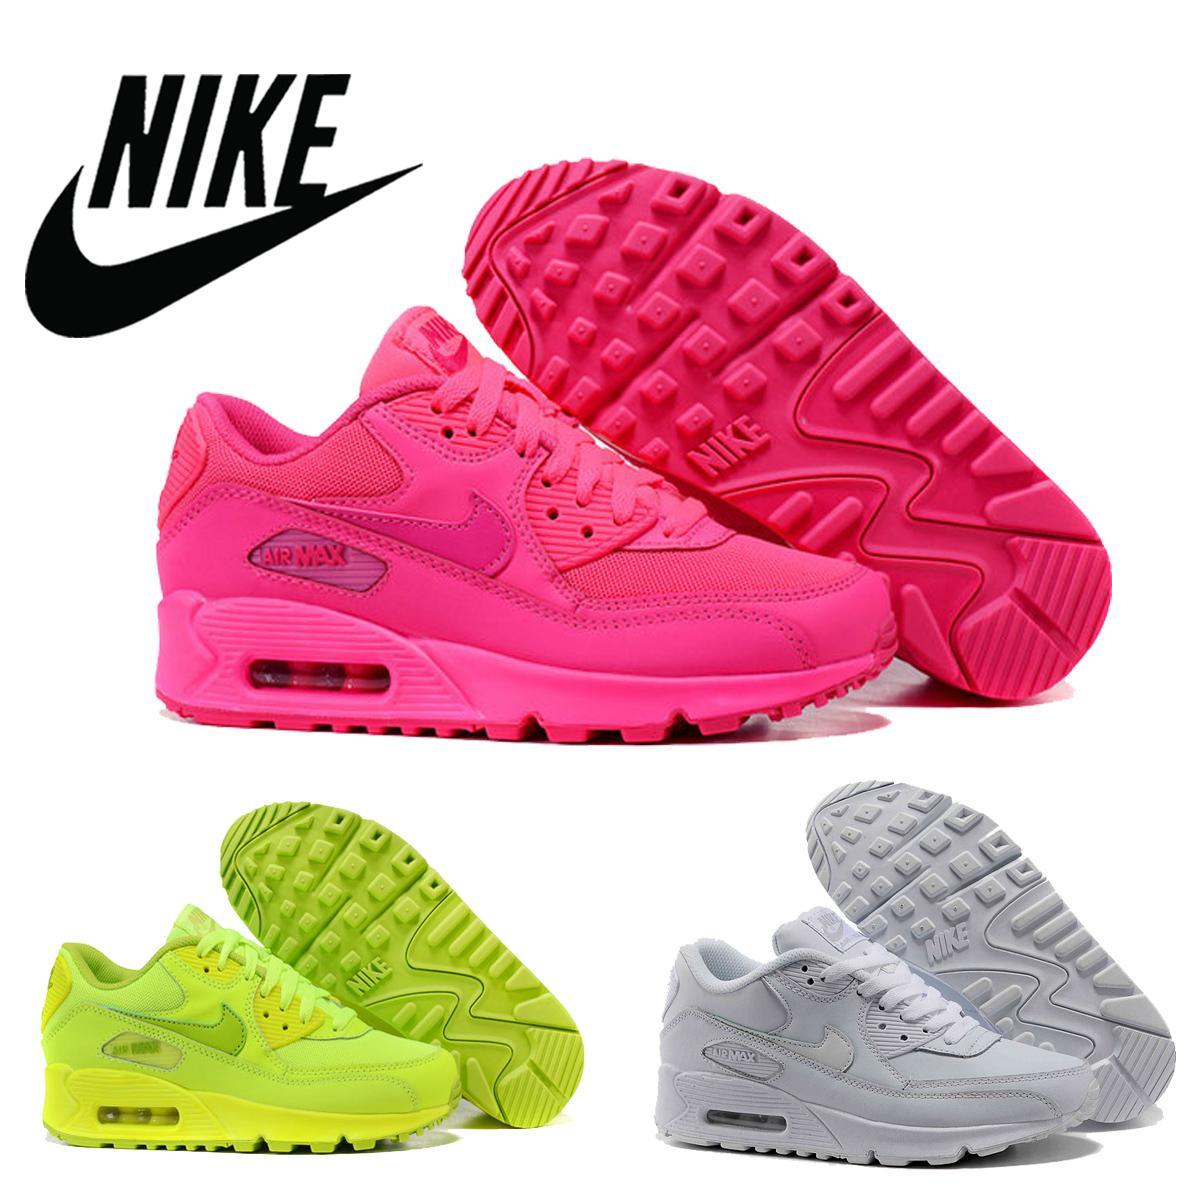 f8e548e4ff1c Nike Air Max 90 GS Hyper Pink Vivid Pink Men Women Runing Shoes ...